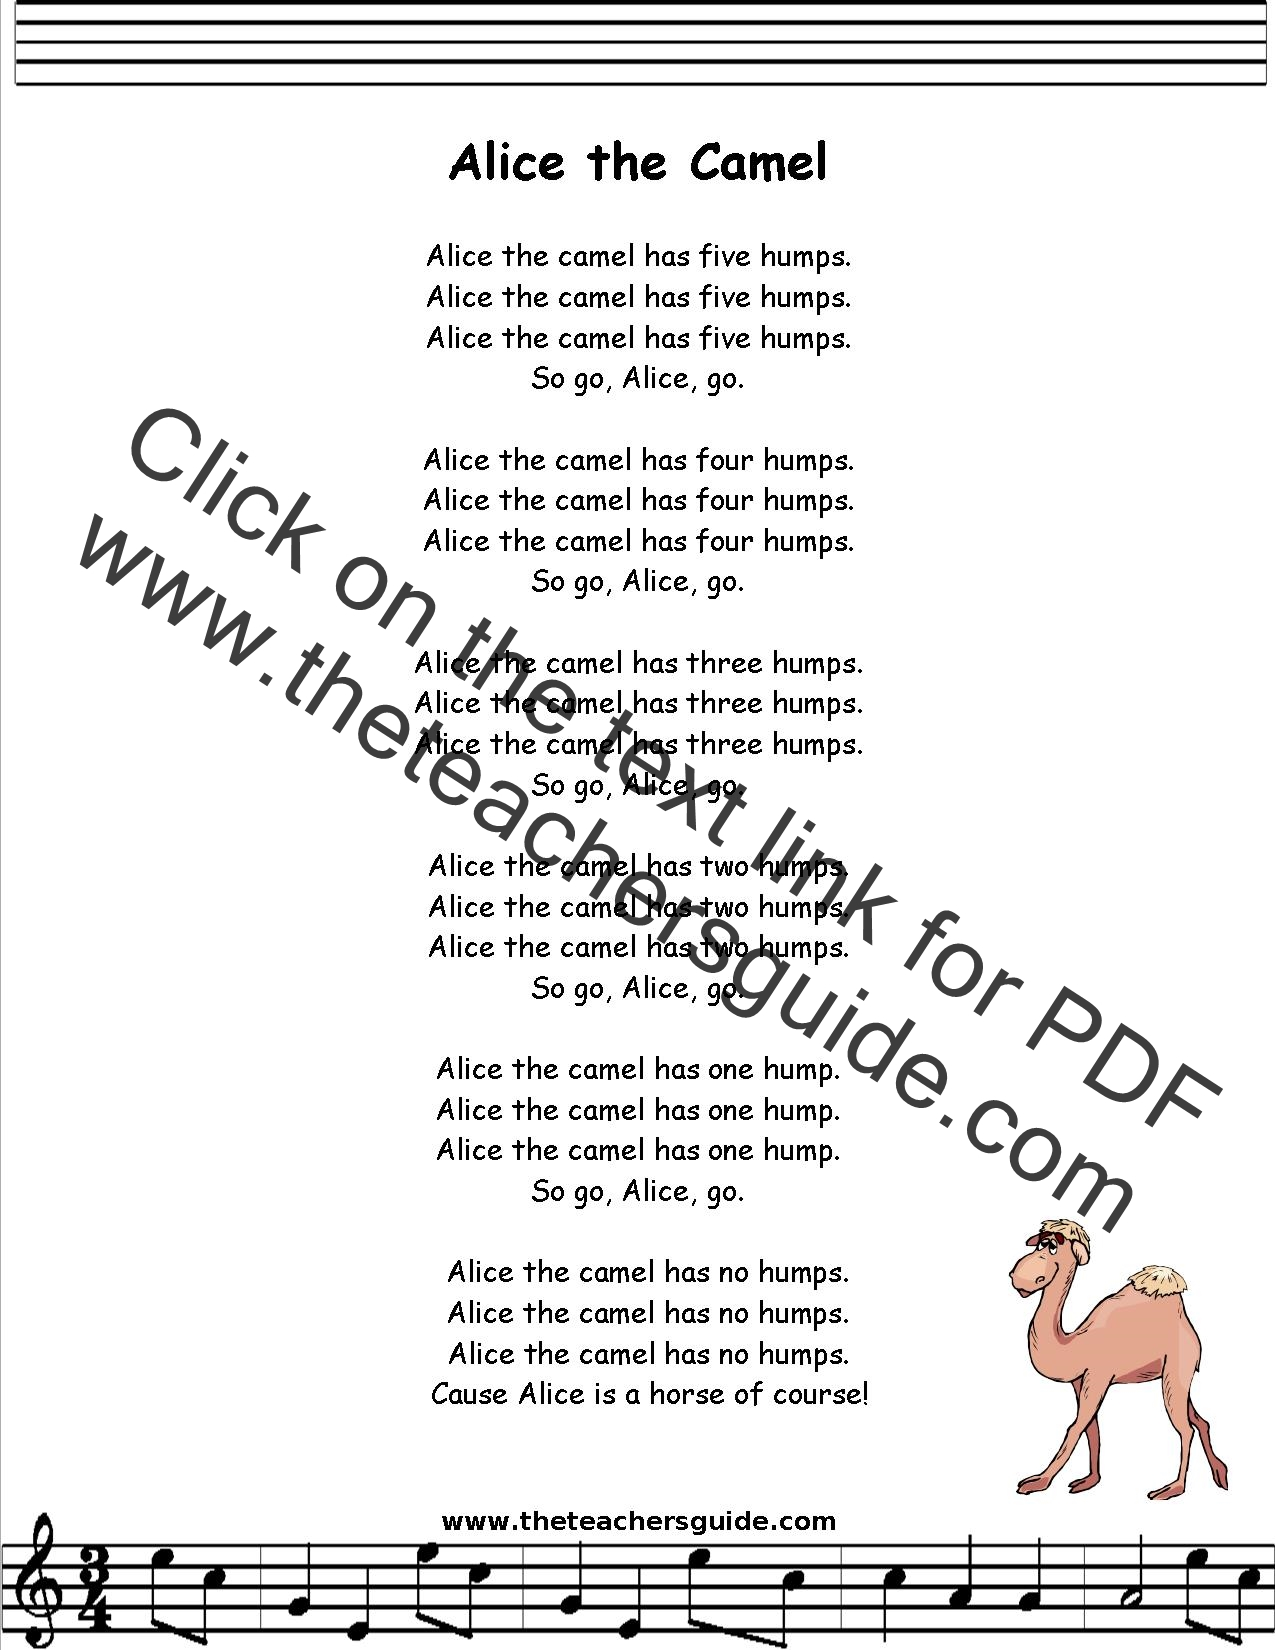 Alice The Camel Lyrics Printout Midi And Video